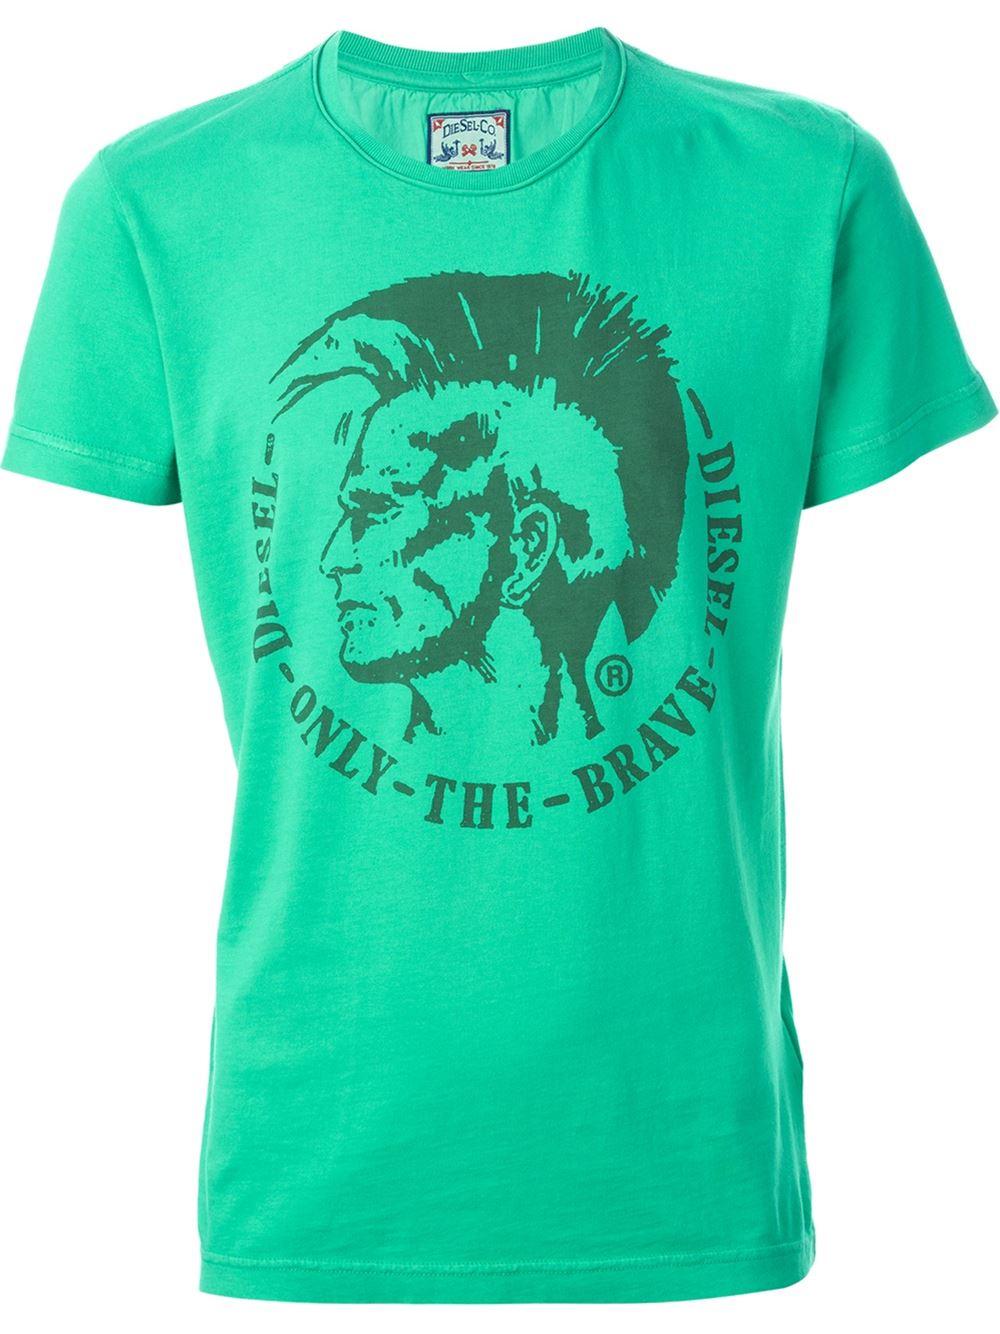 Diesel 't-achell' T-shirt in Green for Men | Lyst